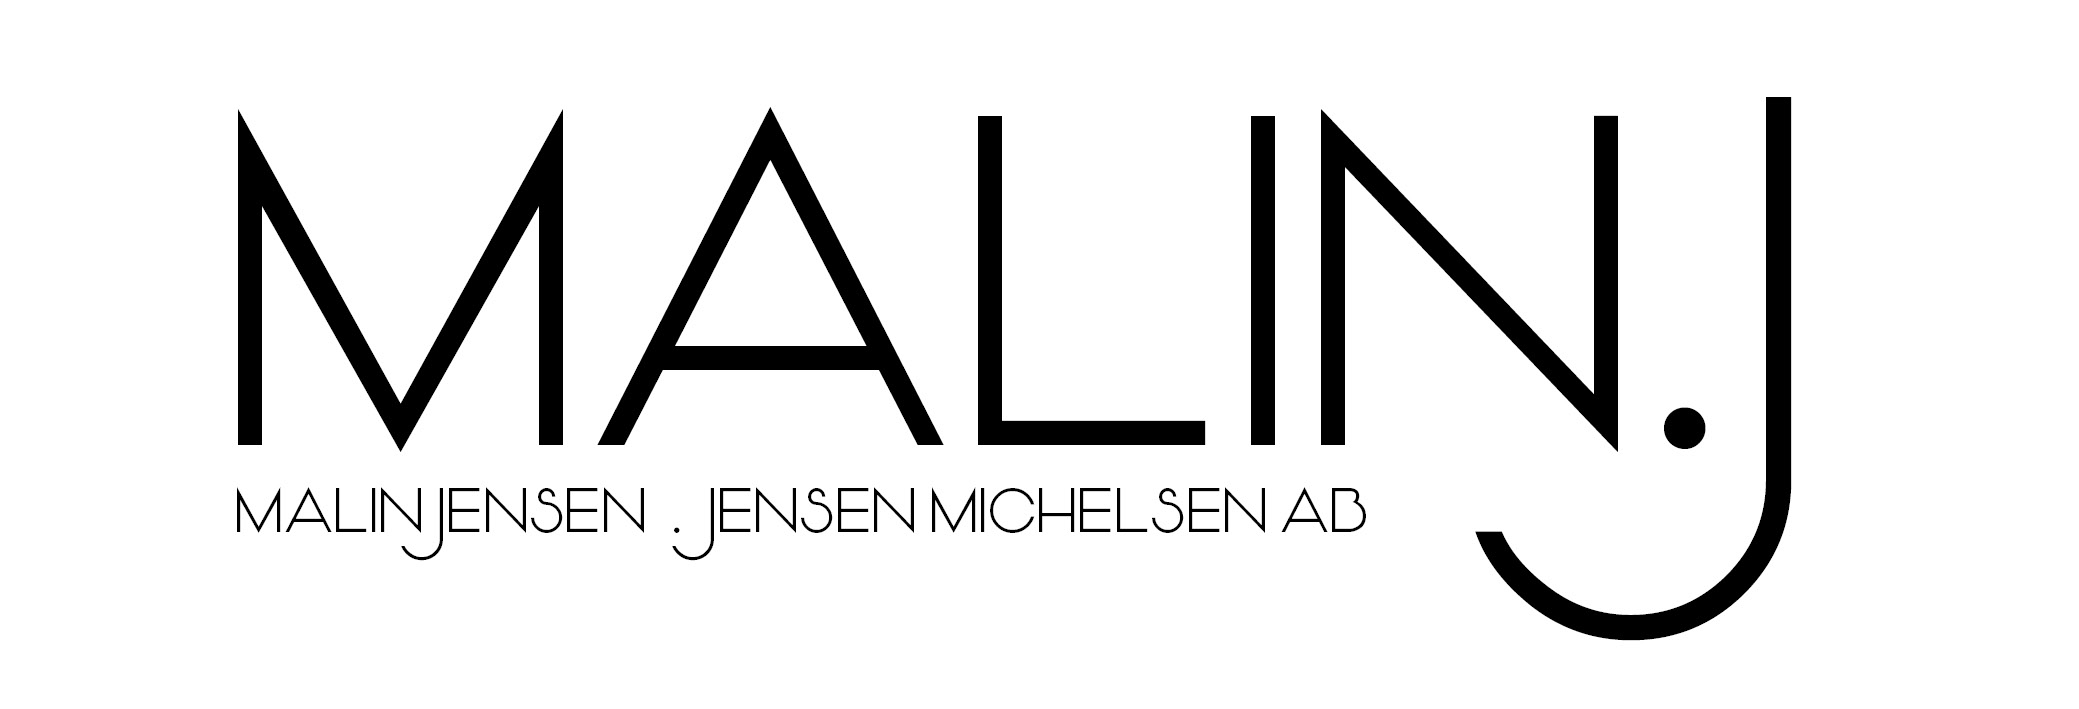 Malin Jensen